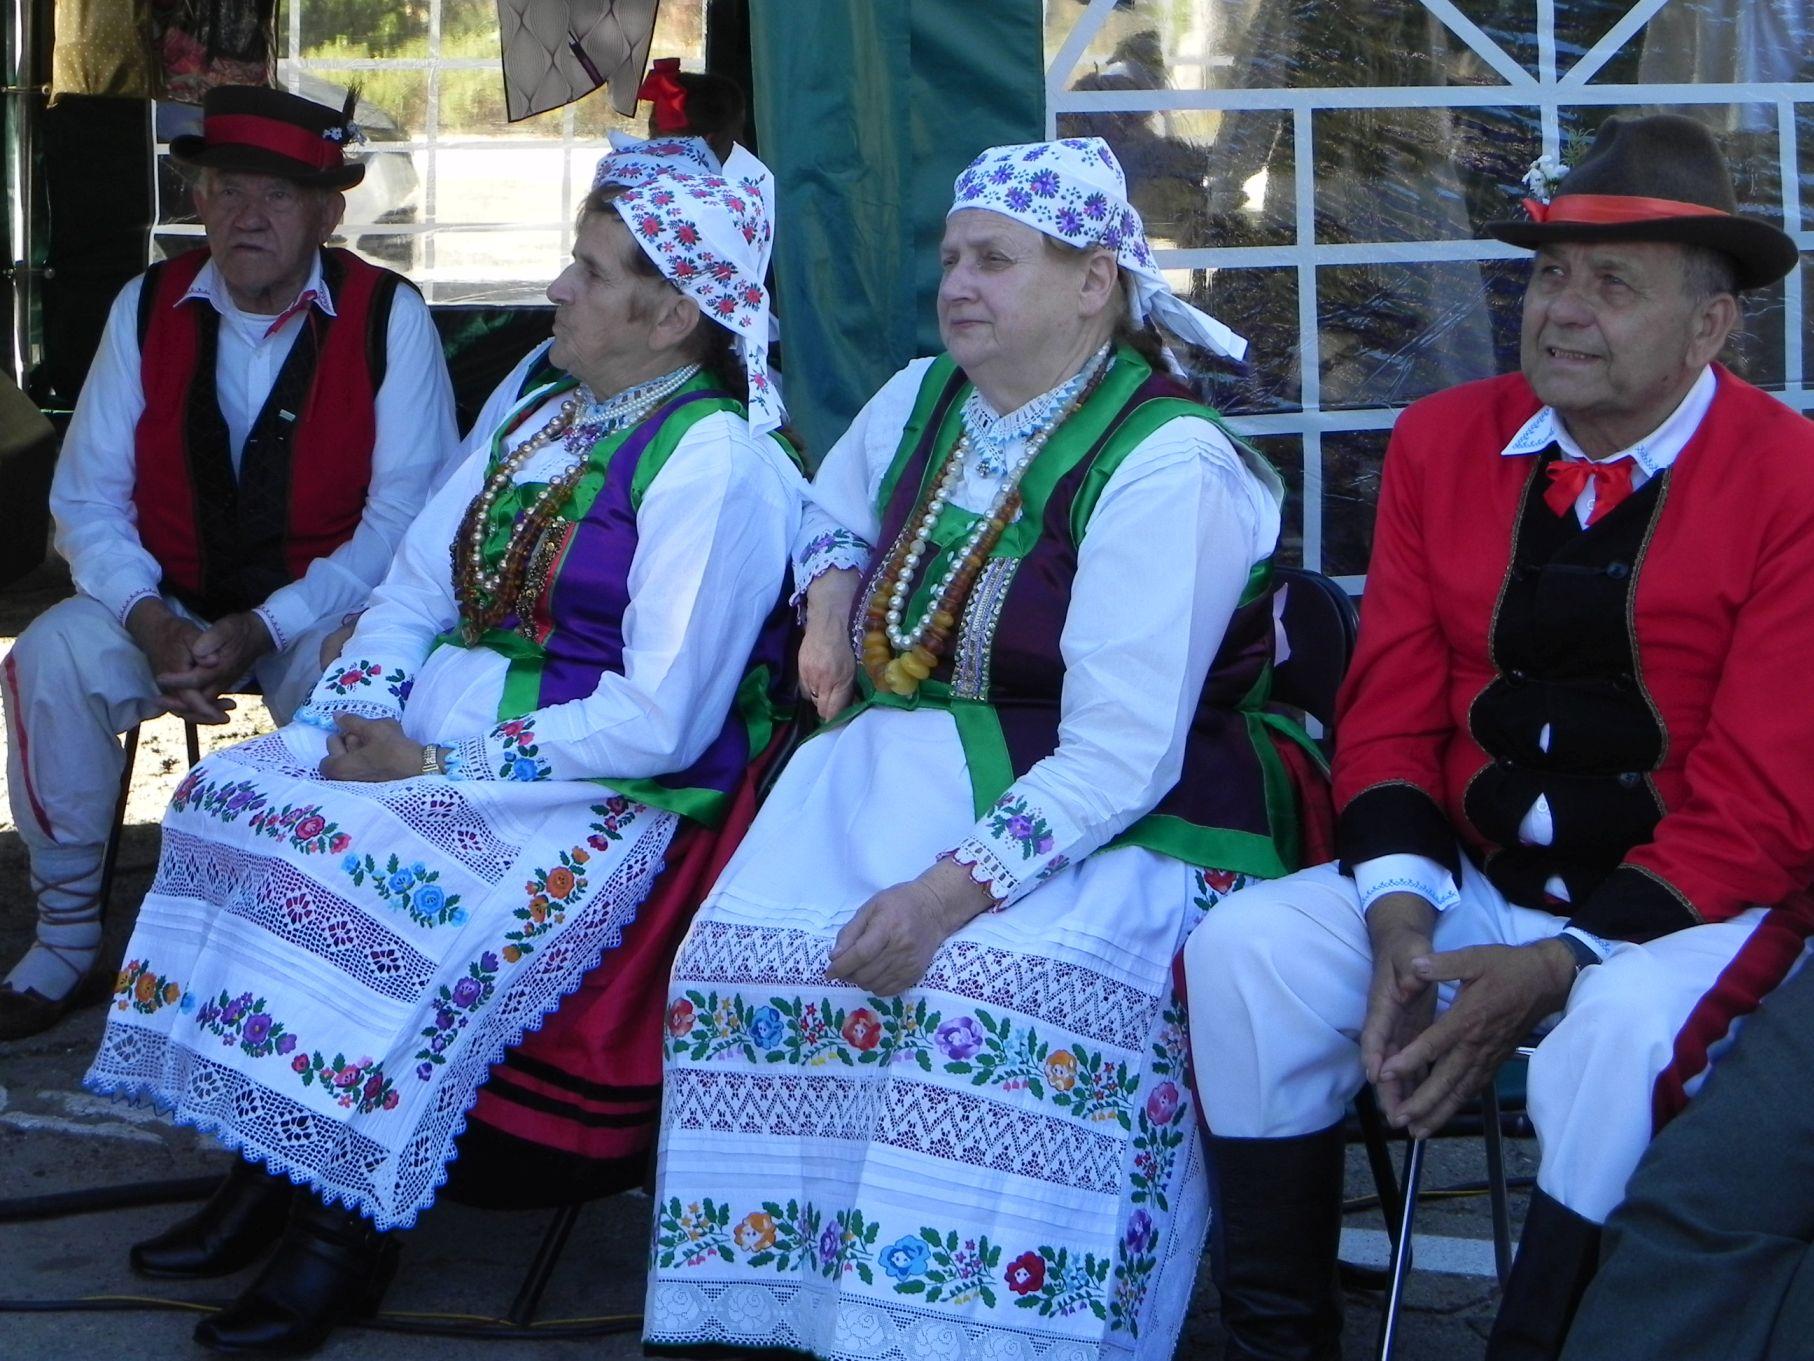 2013-09-10 Festyn - Mińsk Maz (82)